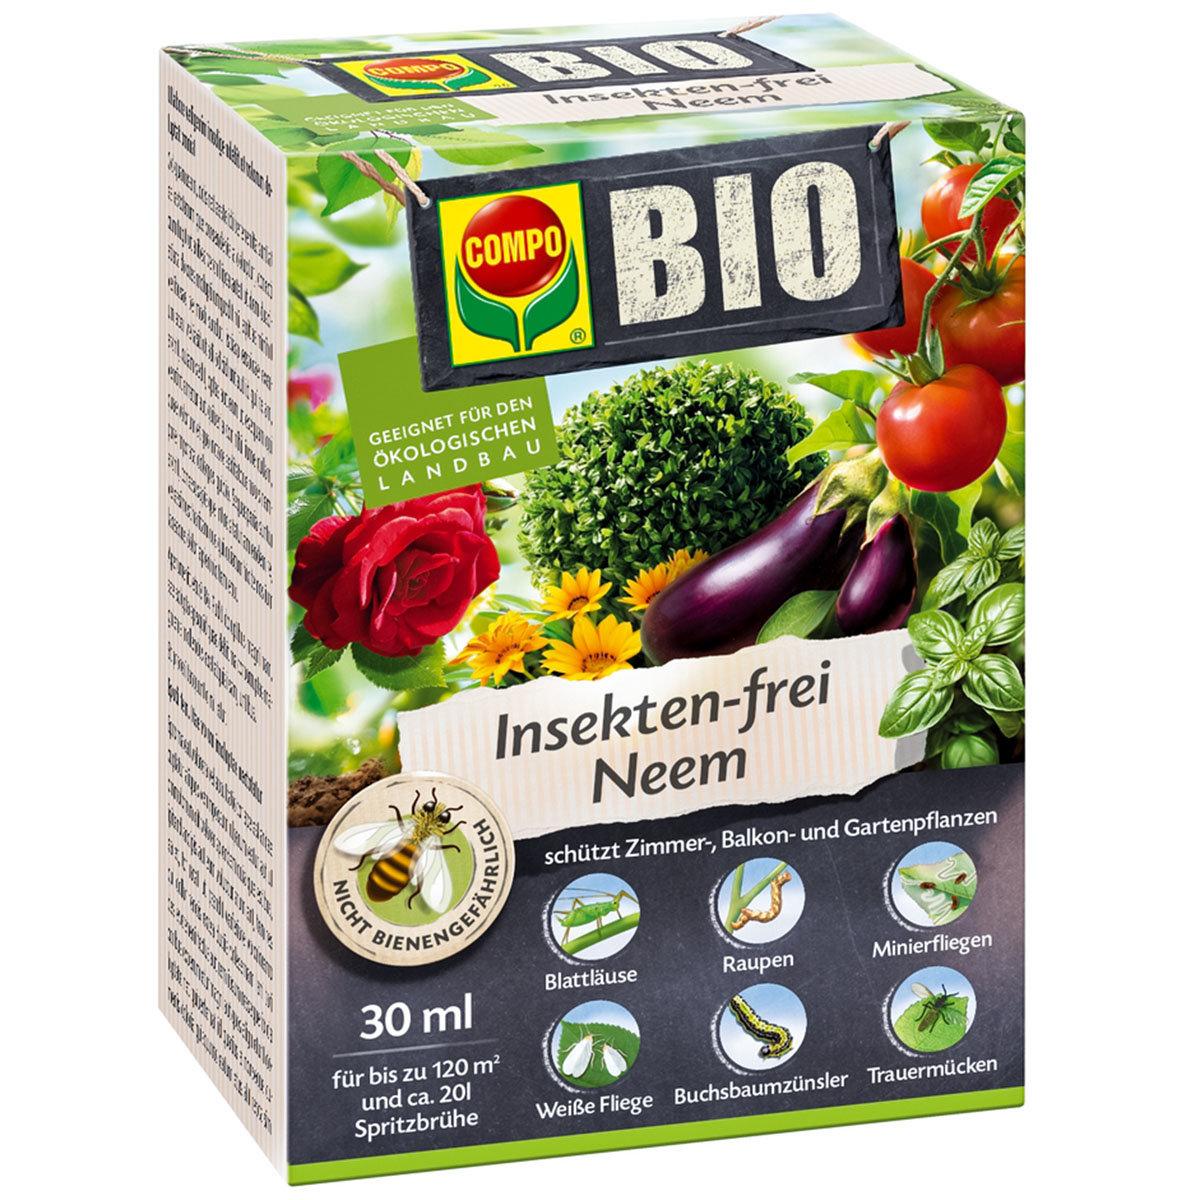 BIO Insekten-frei Neem, 30 ml